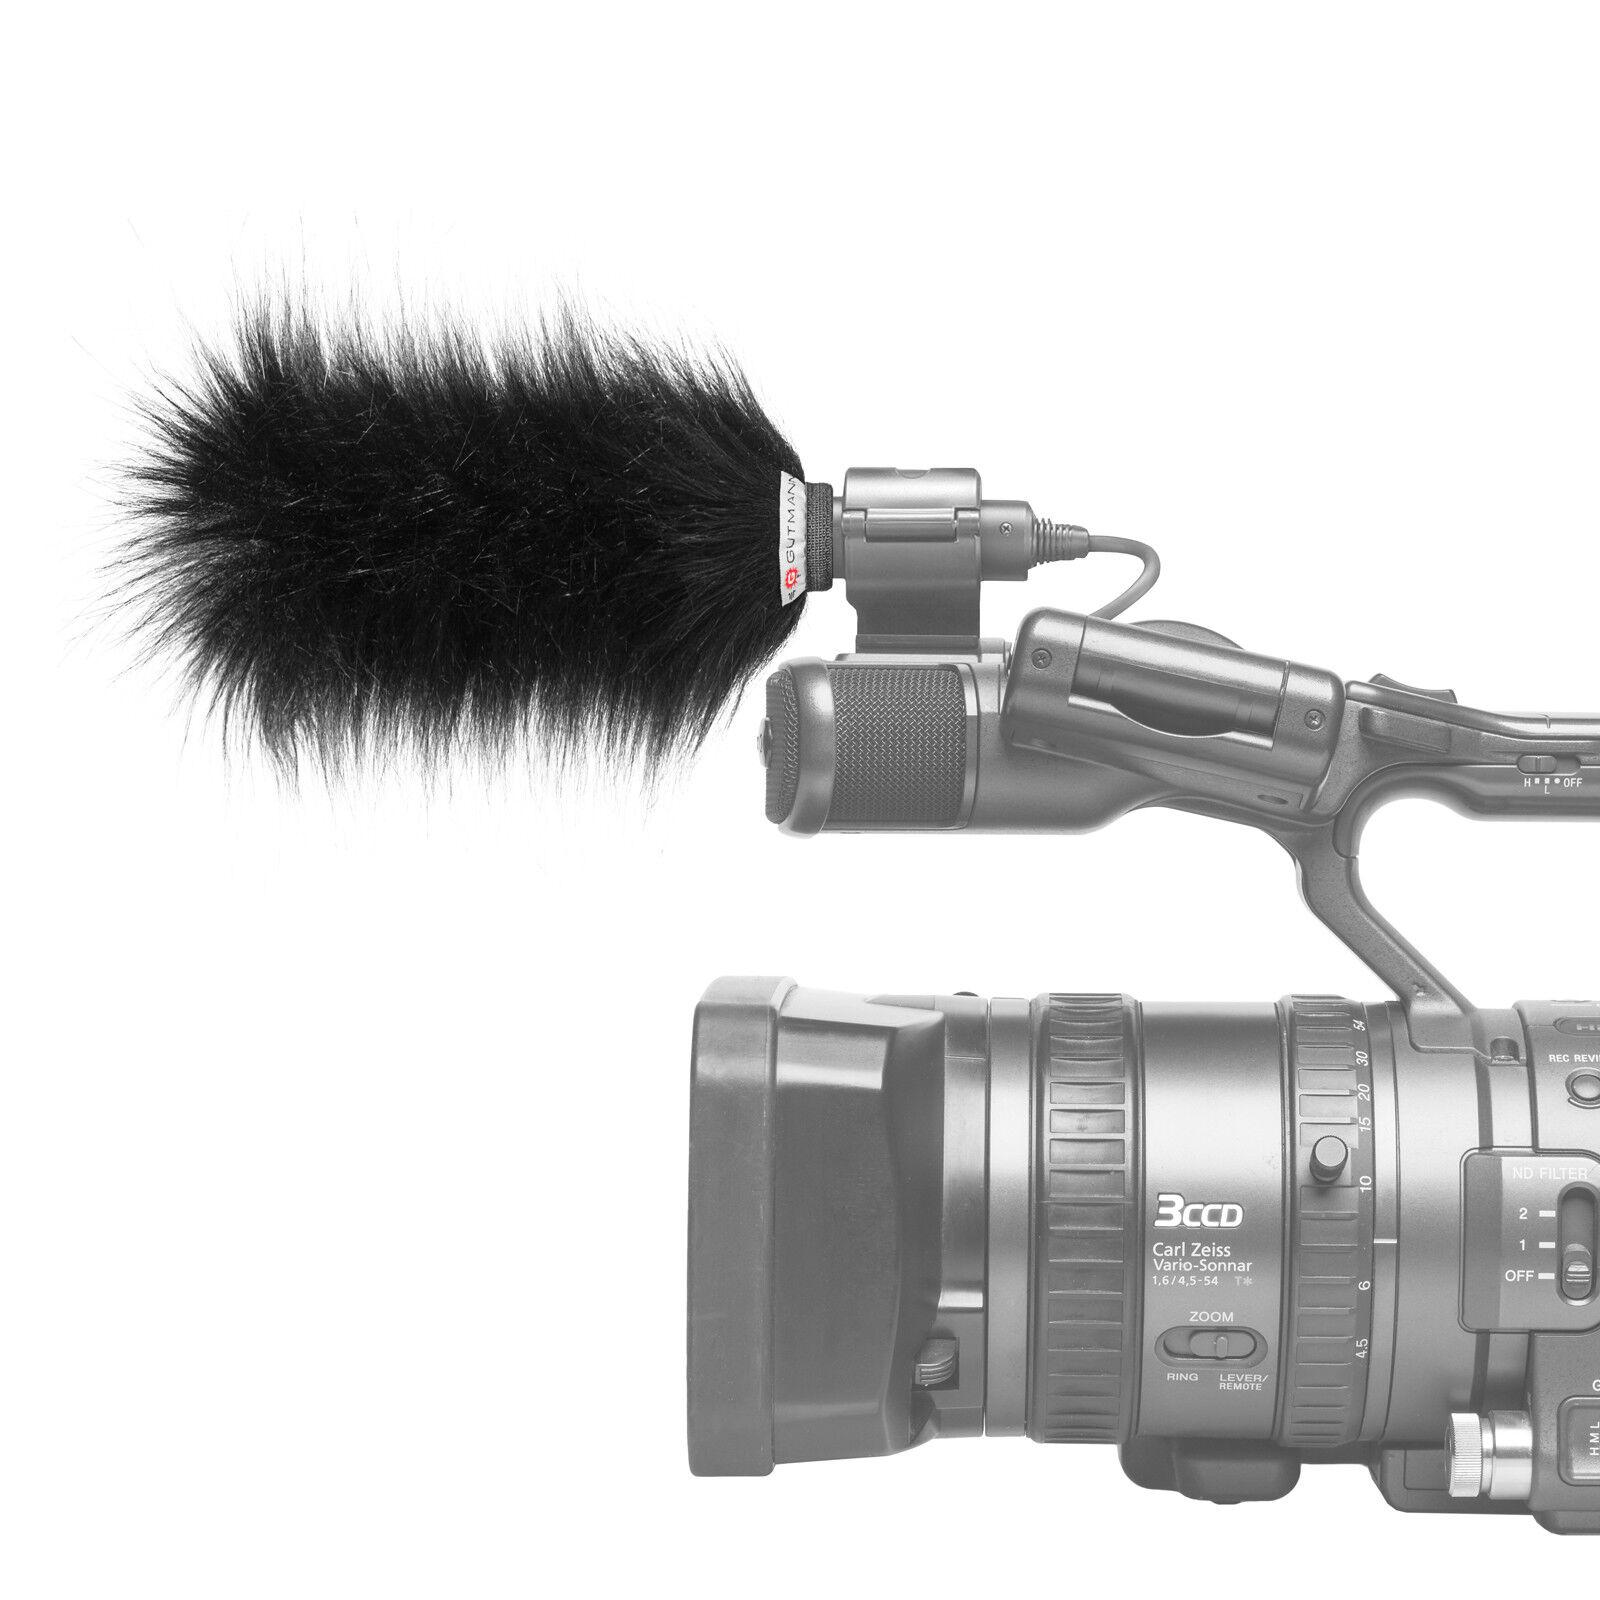 Gutmann Microphone Fur Windscreen Windshield for JVC GY-HM650 / GY-HM650E